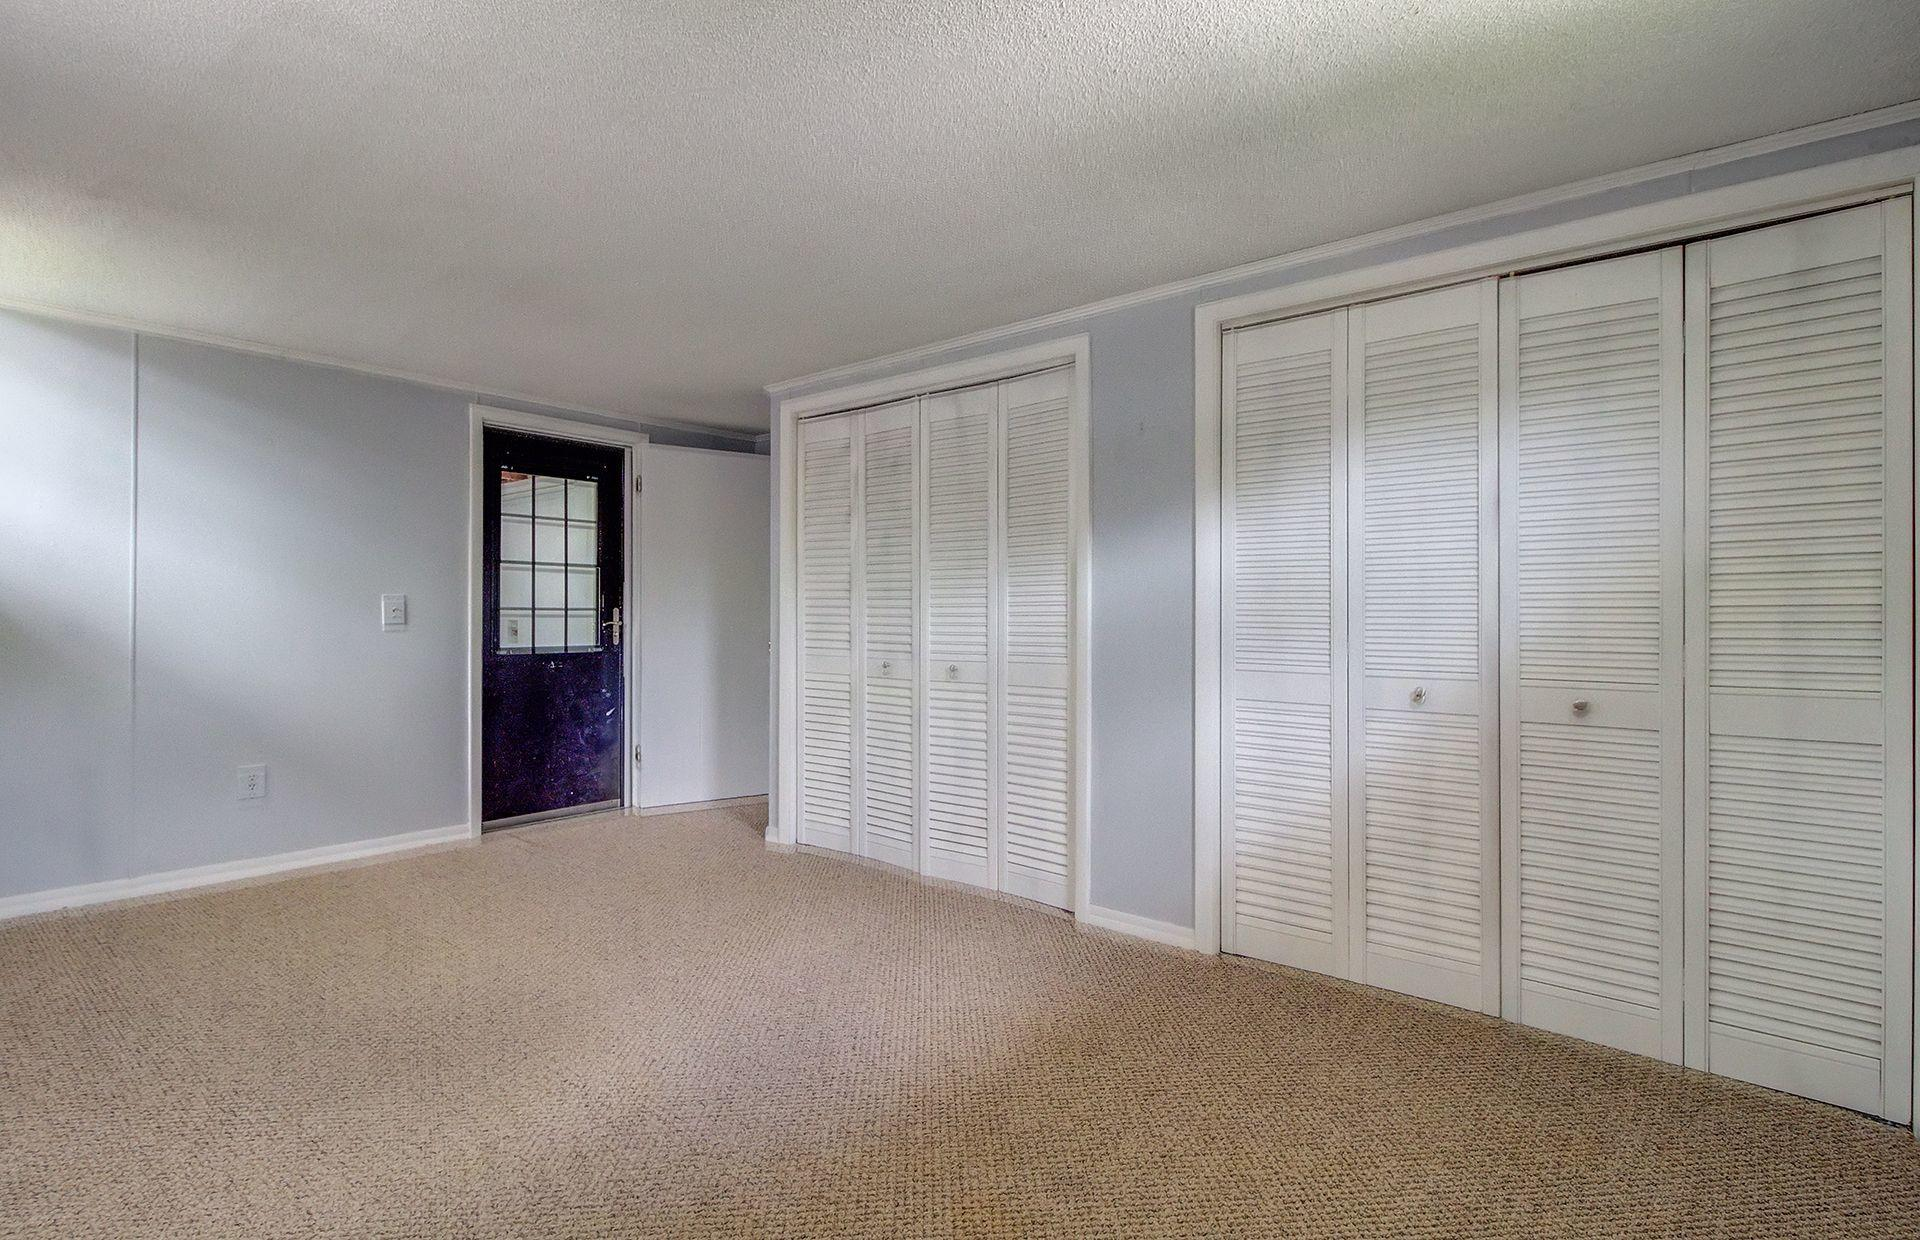 Belvedere Estates Homes For Sale - 6010 Ridgecrest, Hanahan, SC - 26